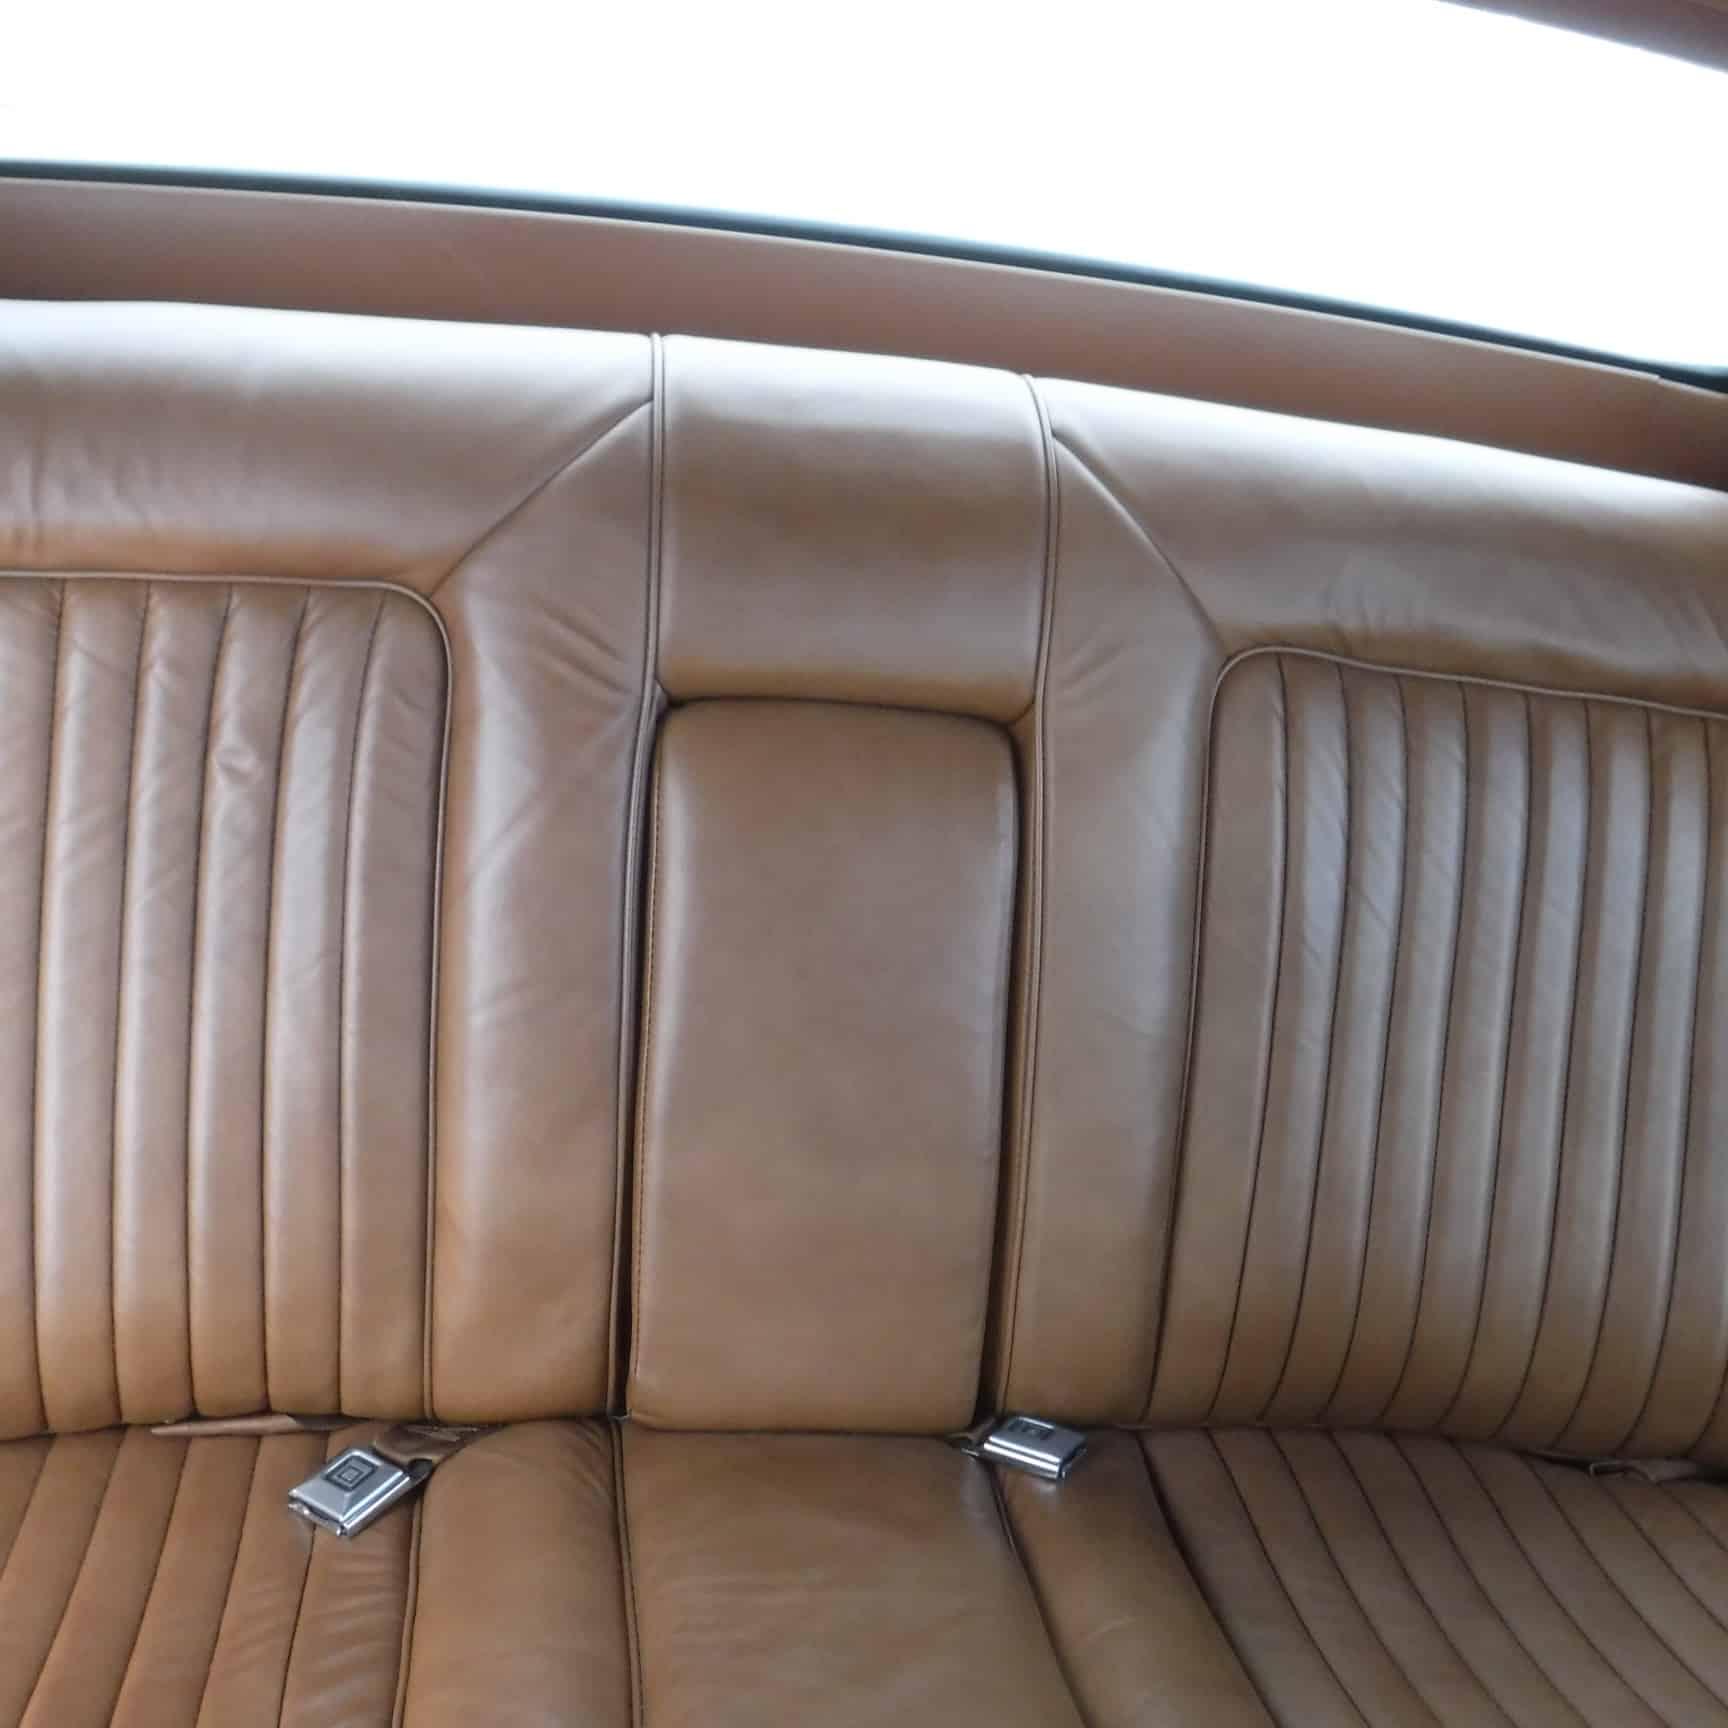 1980 Cadillac 076